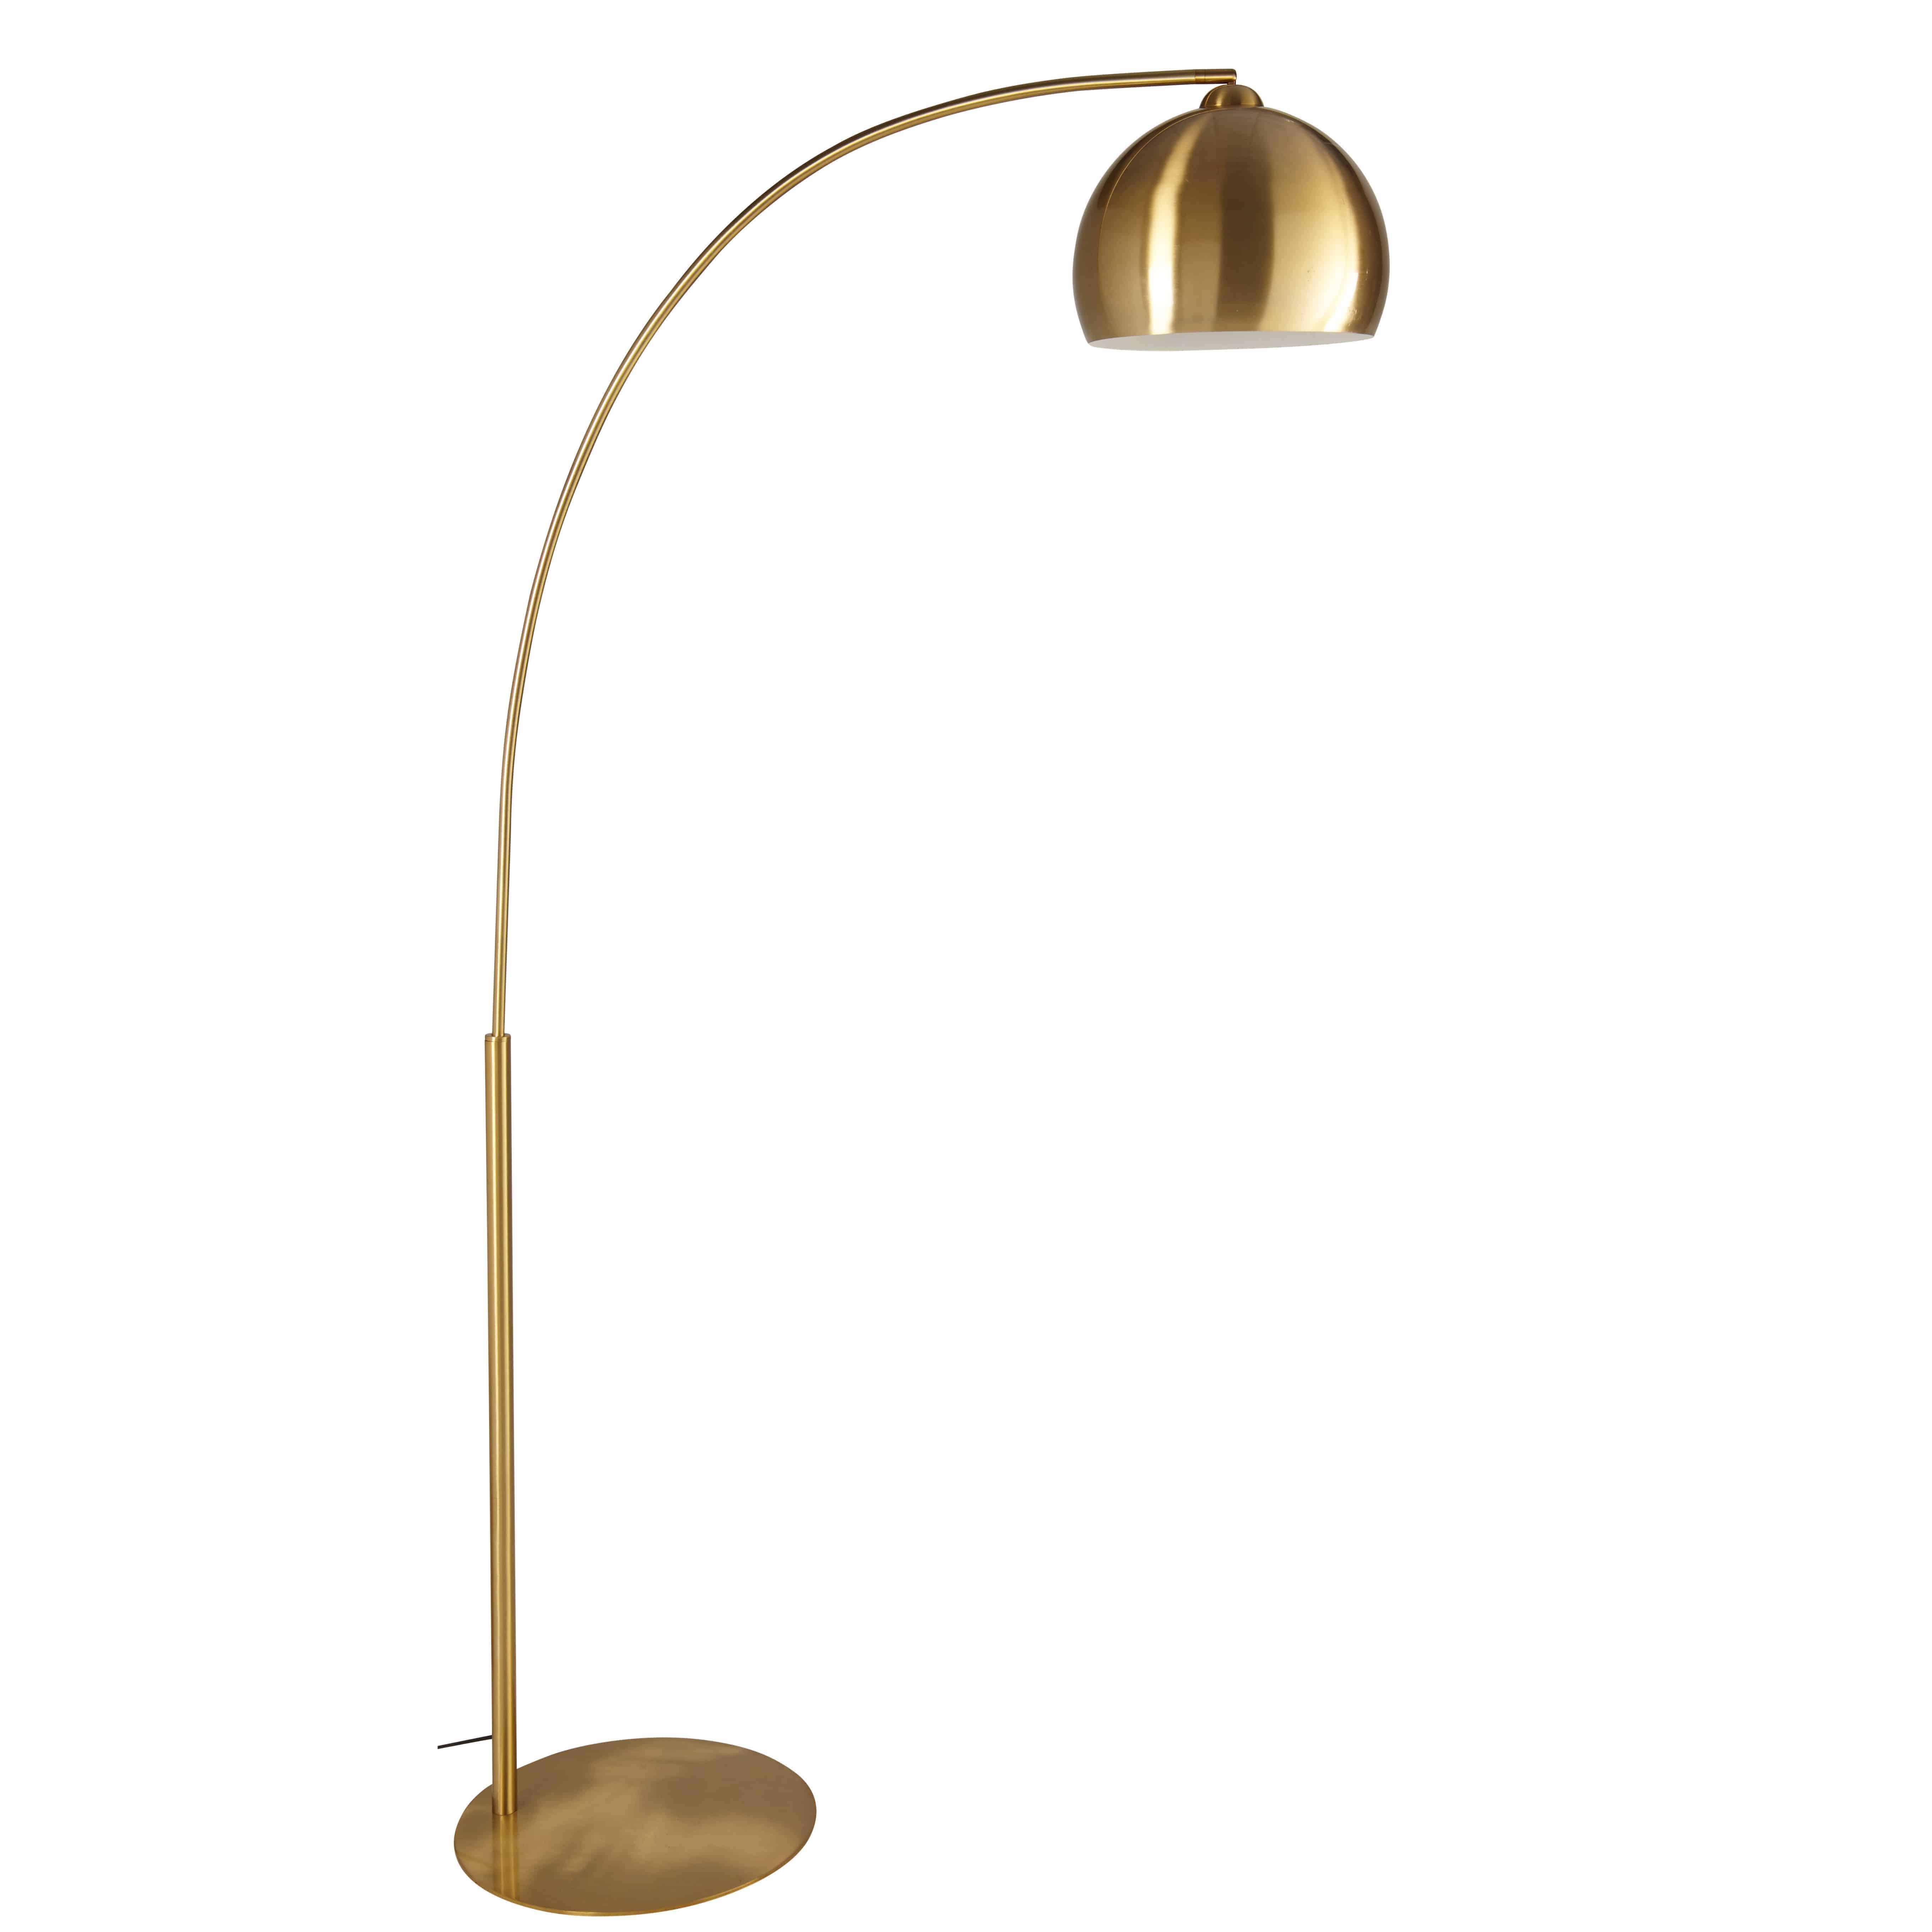 414e4961c8ef329ea50c957446a895ac Faszinierend Stehlampe Studio Schwarz Gold Dekorationen